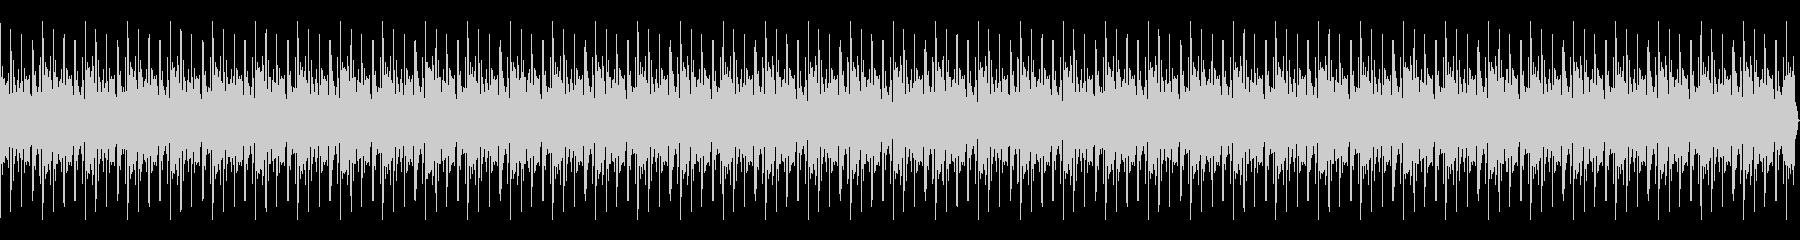 【852Hz】を想定のヒーリング曲です。の未再生の波形